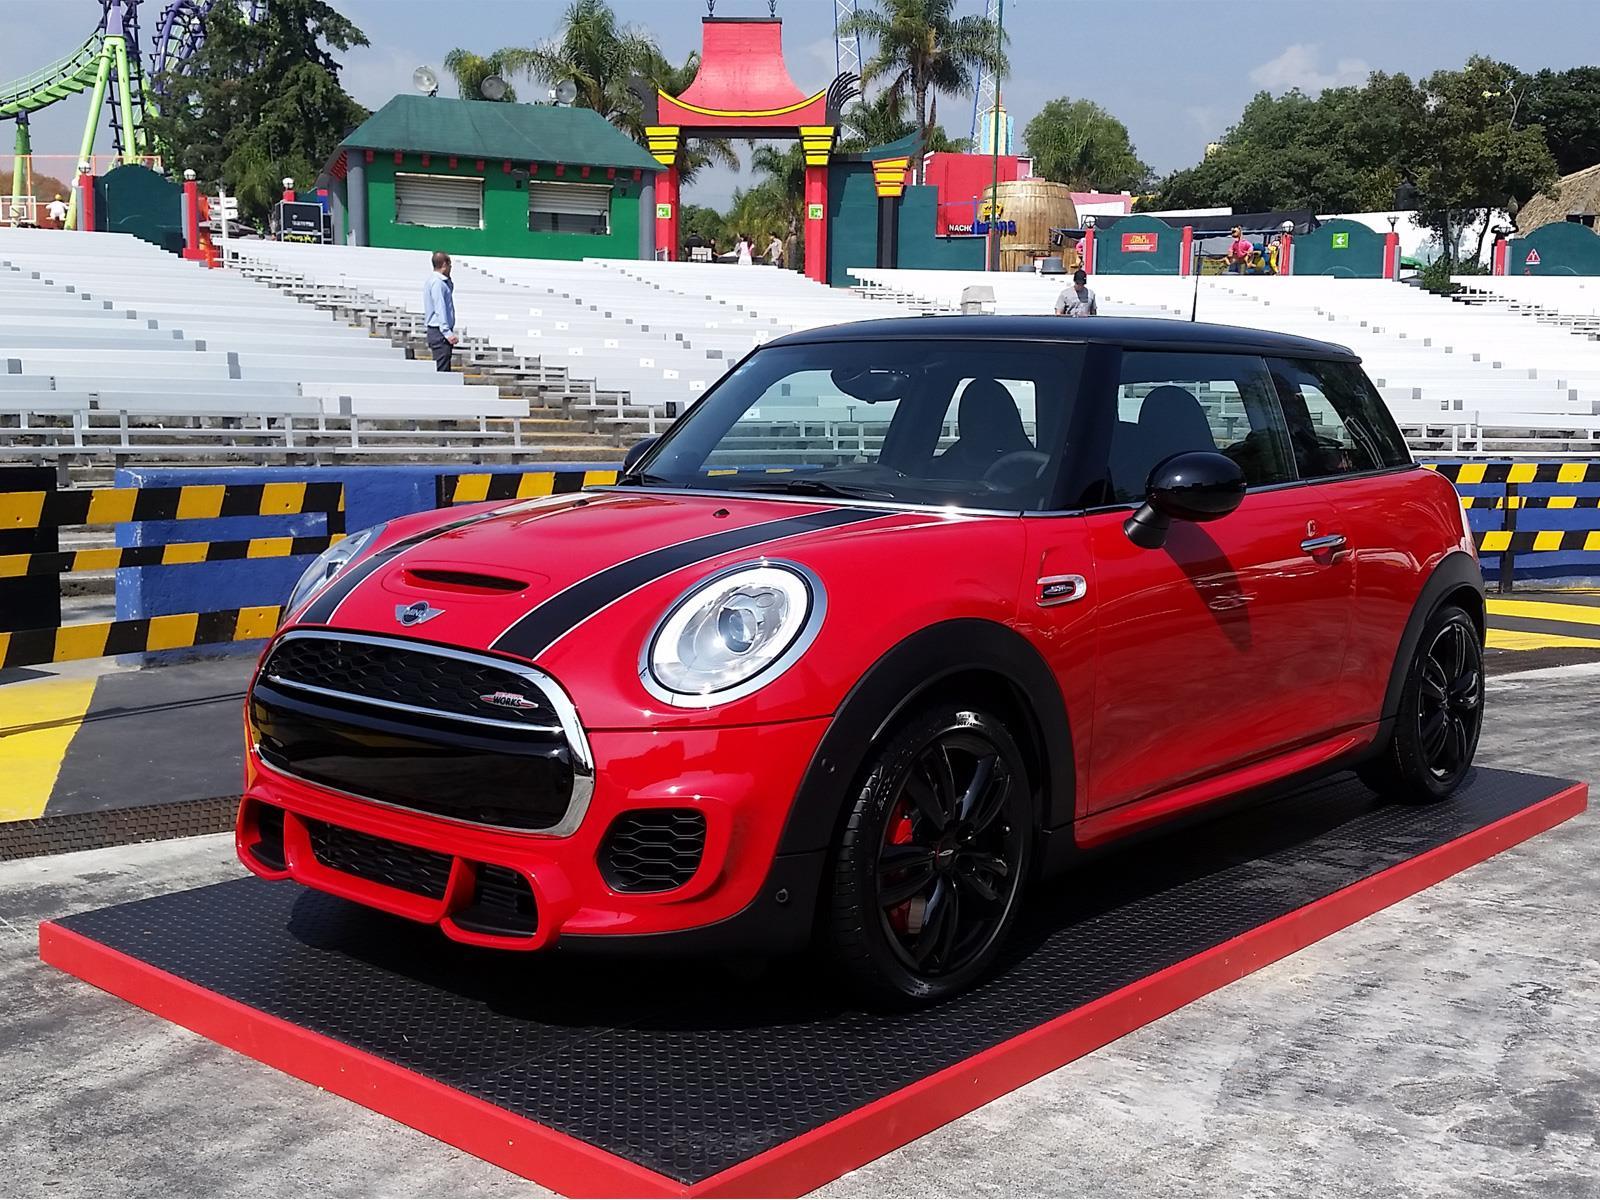 MINI John Cooper Works llega a México desde $480,000 pesos - Autocosmos.com